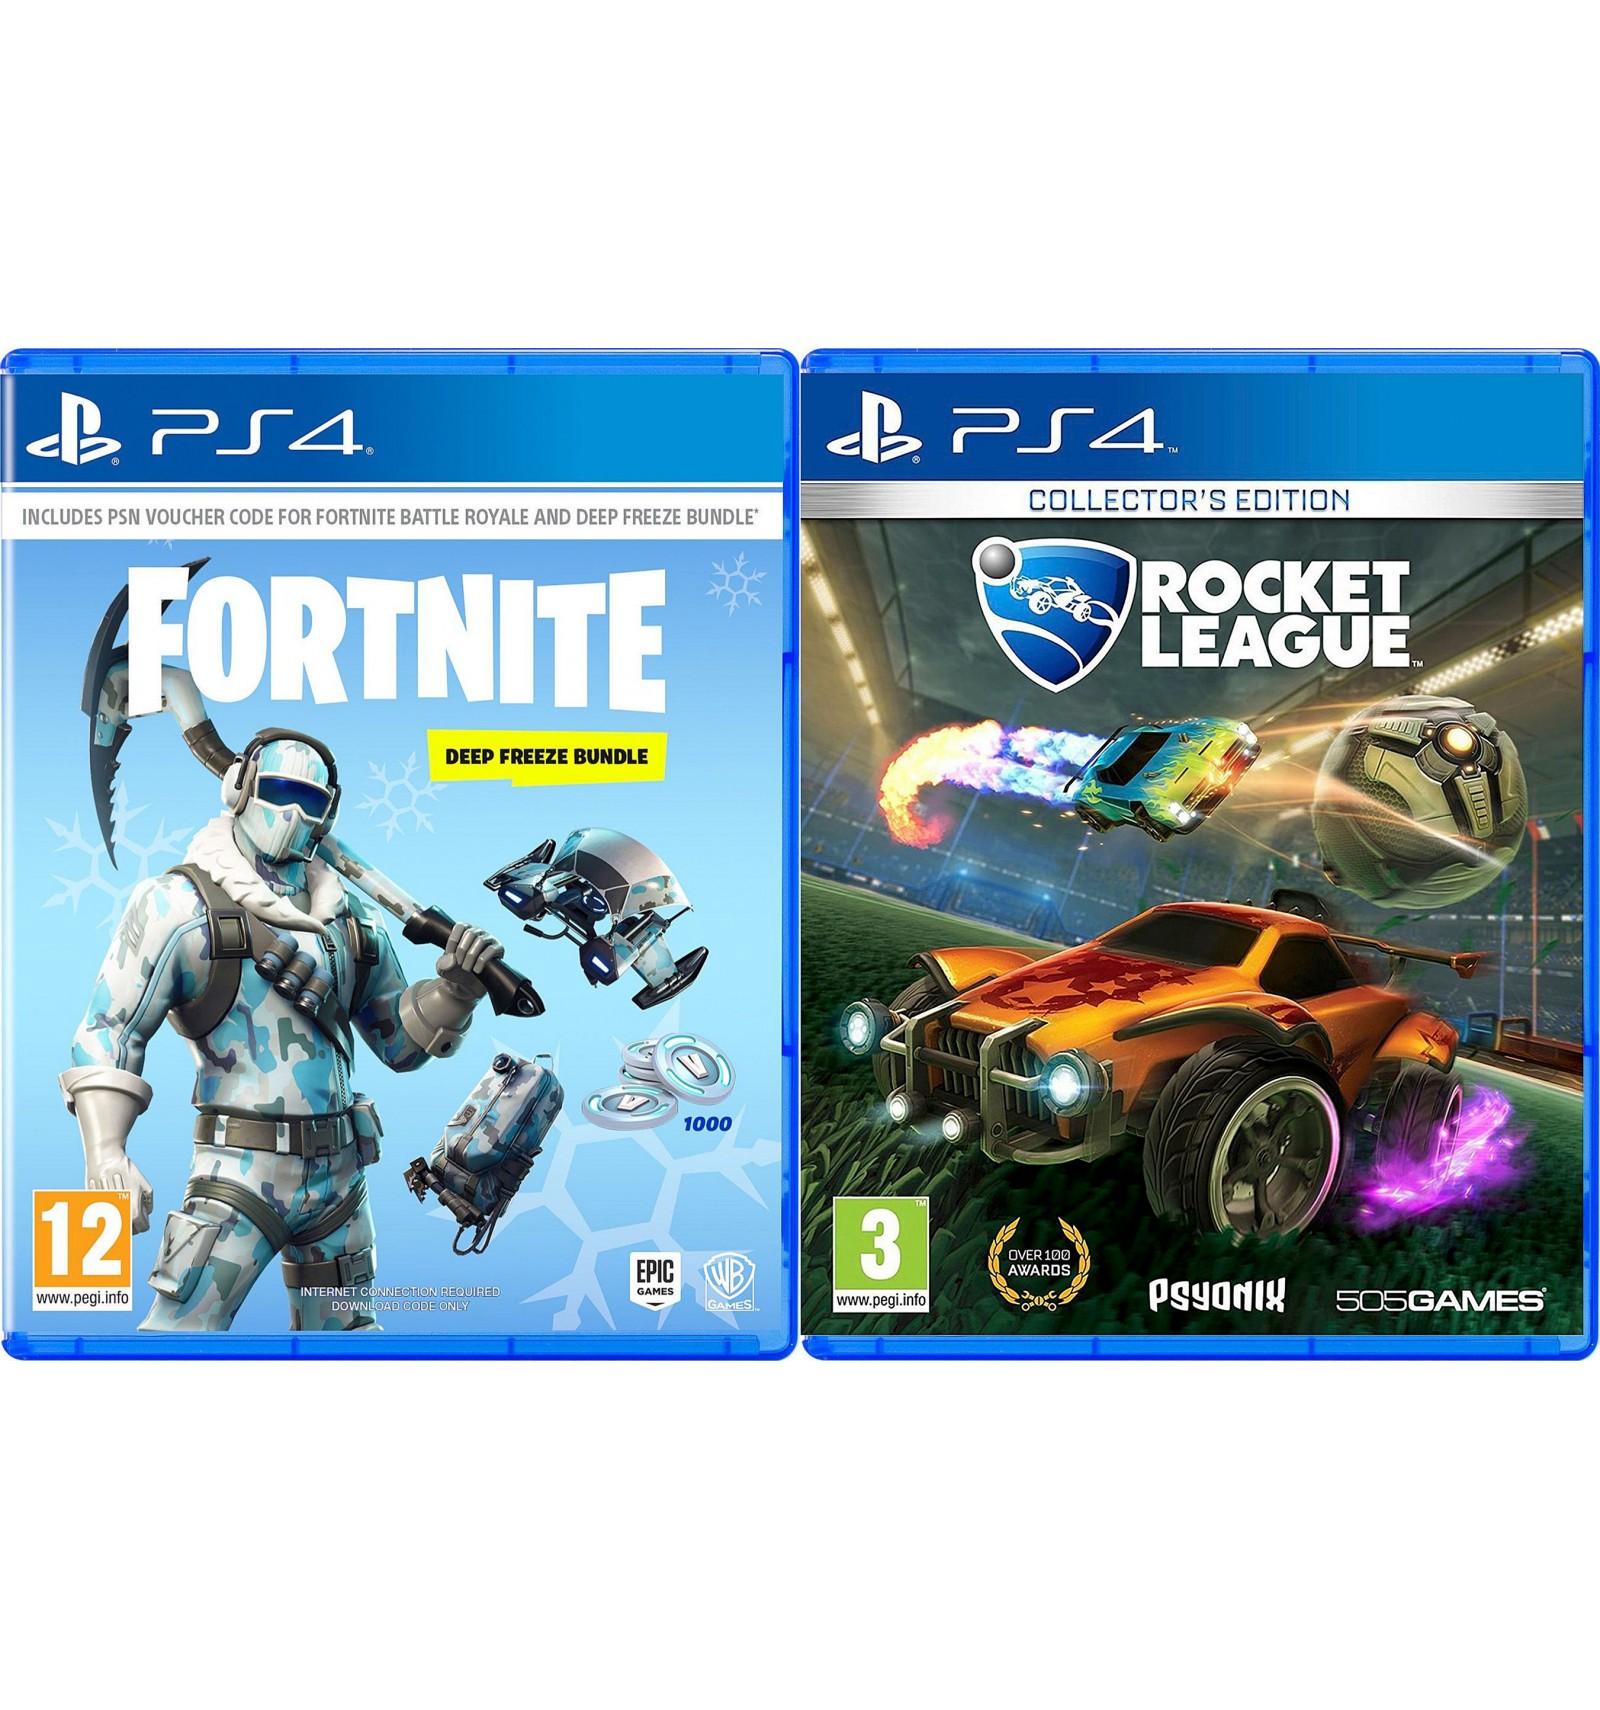 Sony PS4 Slim 1TB + Fortnite: Deep Freeze Bundle + Rocket League